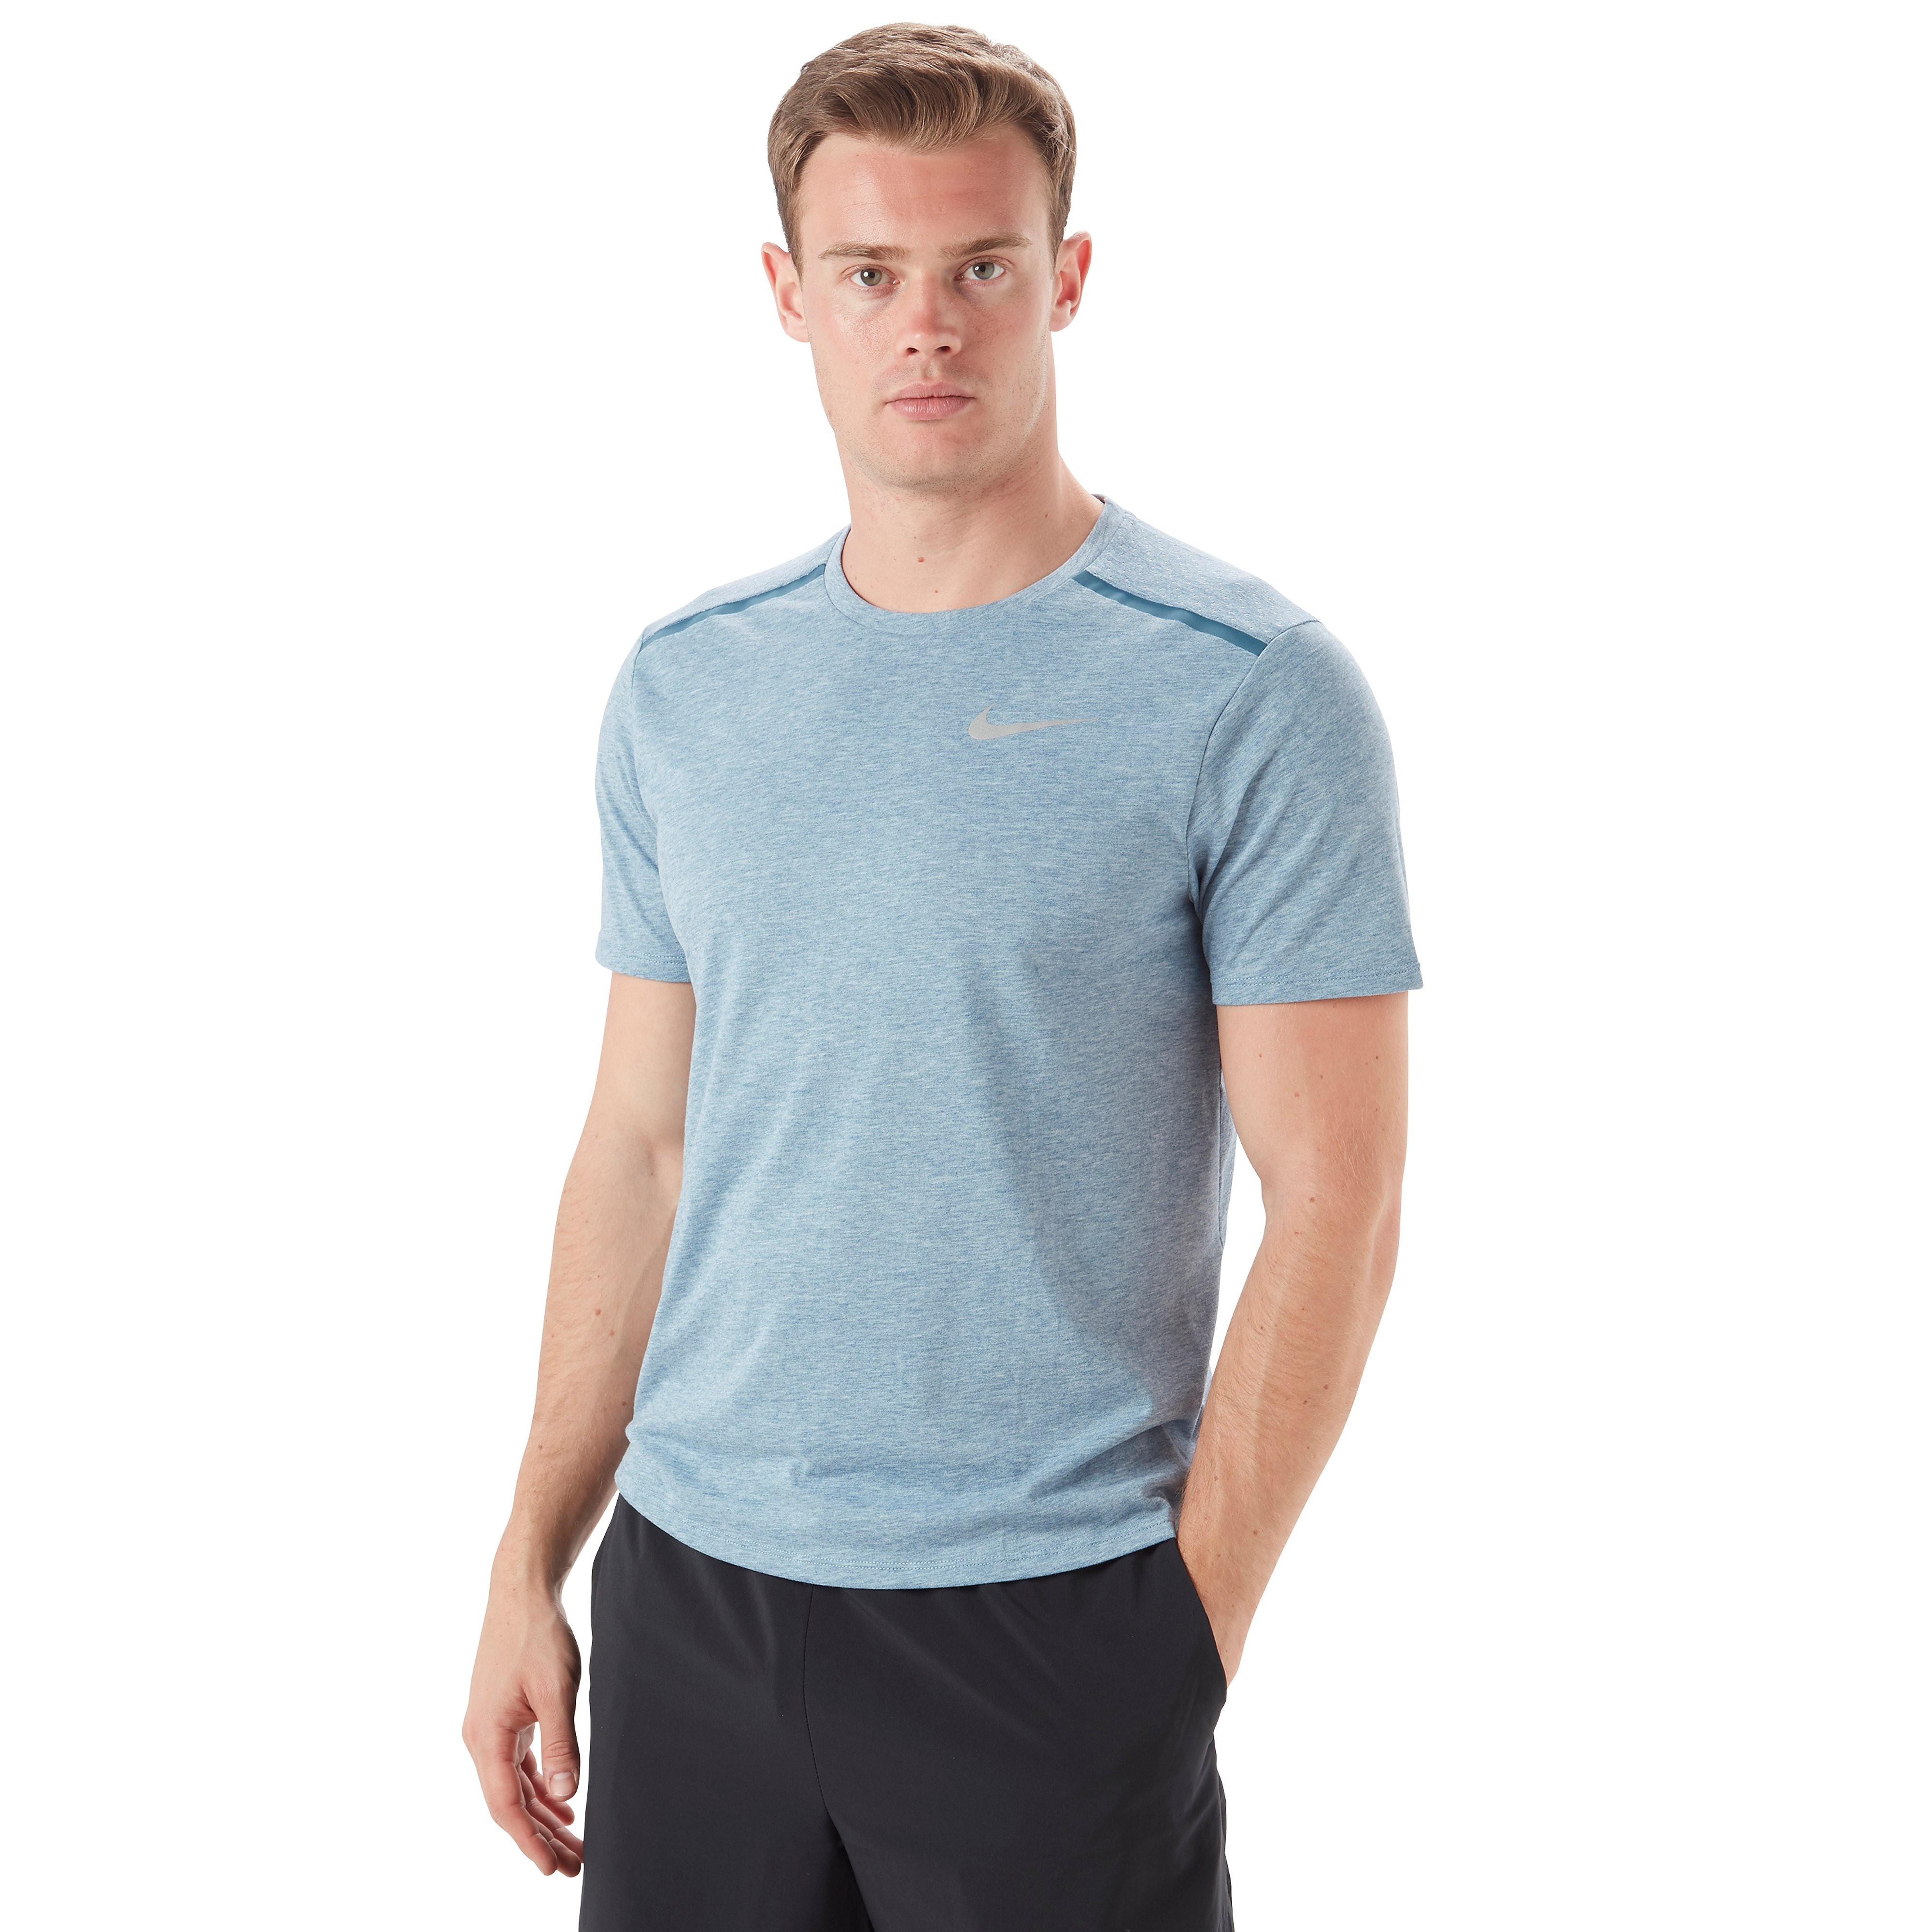 Nike Breathe Tailwind Short Sleeve Men's Running Top